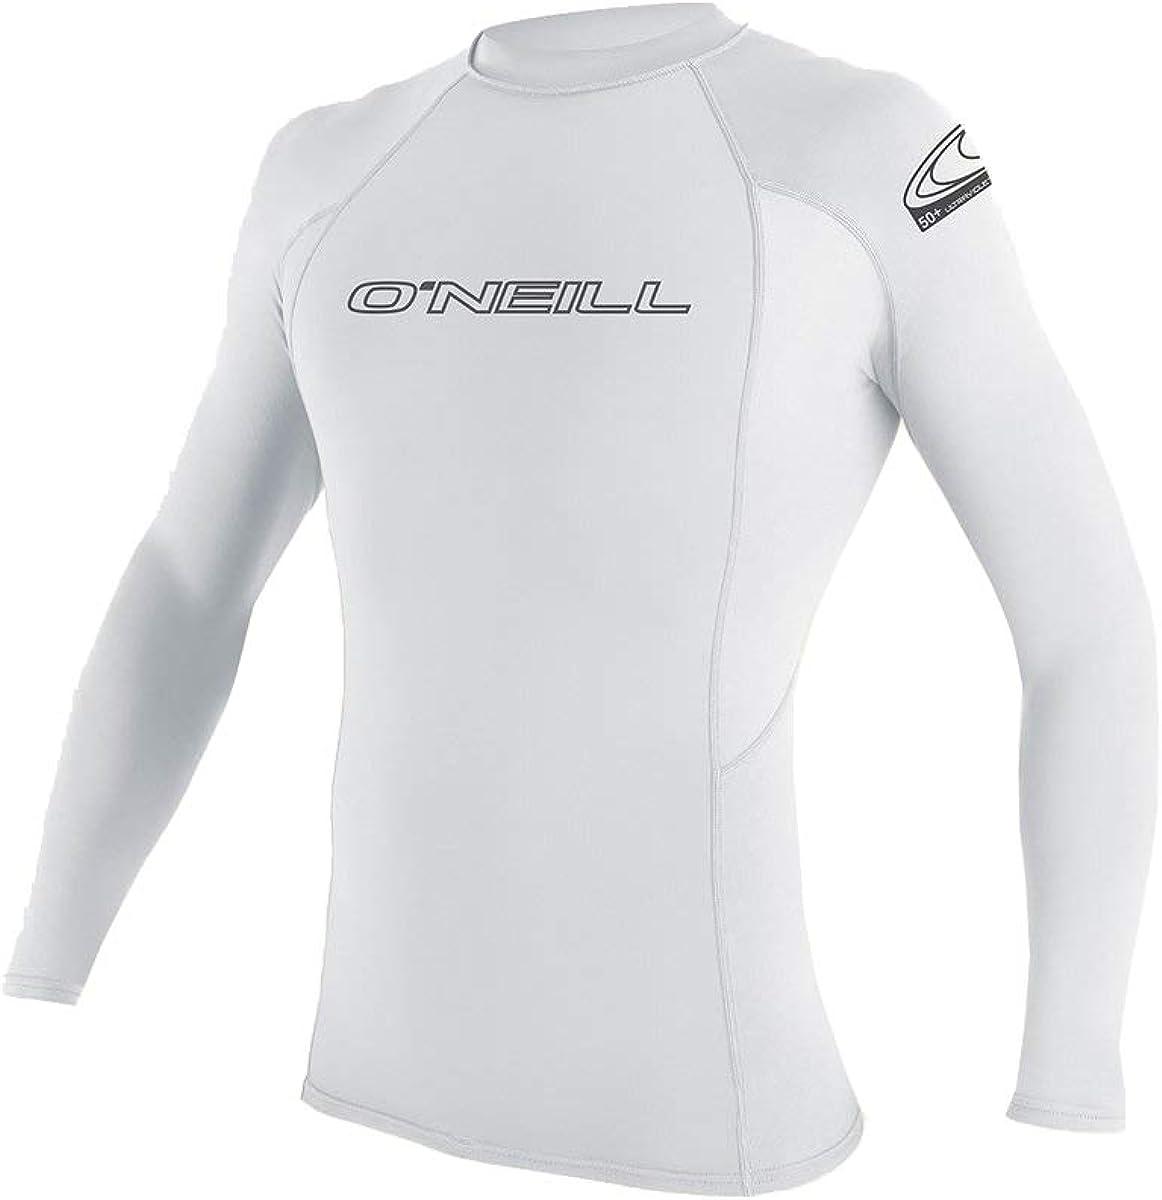 O'NEILL Basic Skins L/S Performance Fit Rashguard White